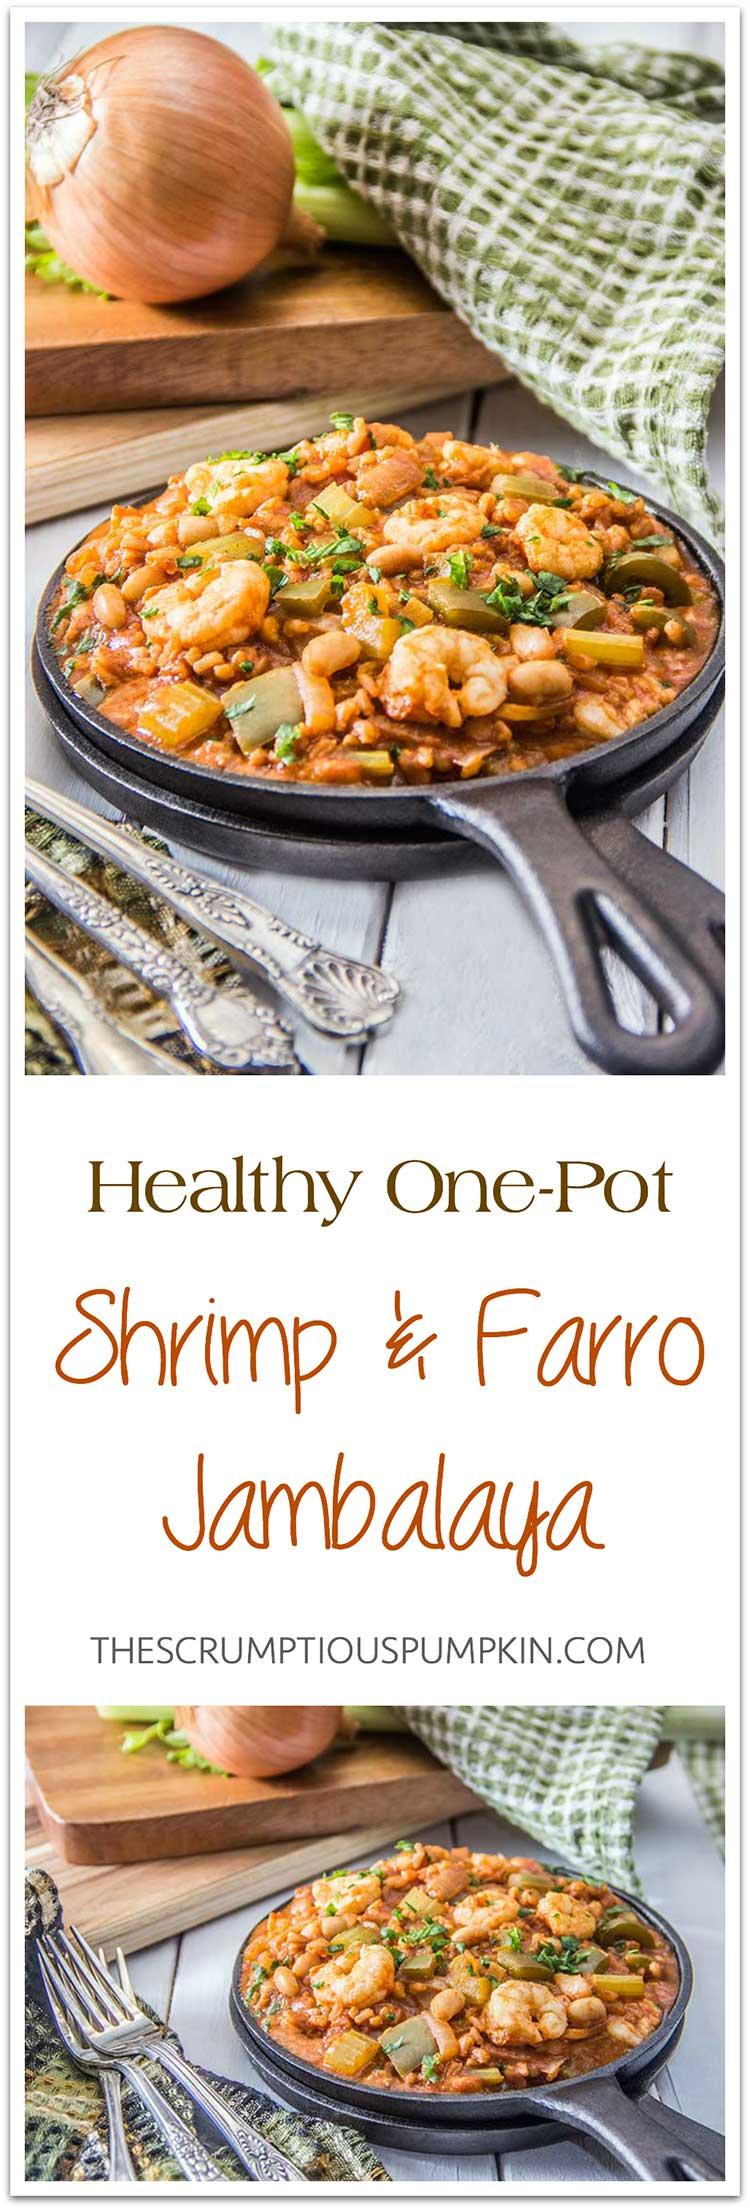 Healthy-One-Pot-Shrimp-White-Bean-Farro-Jambalaya